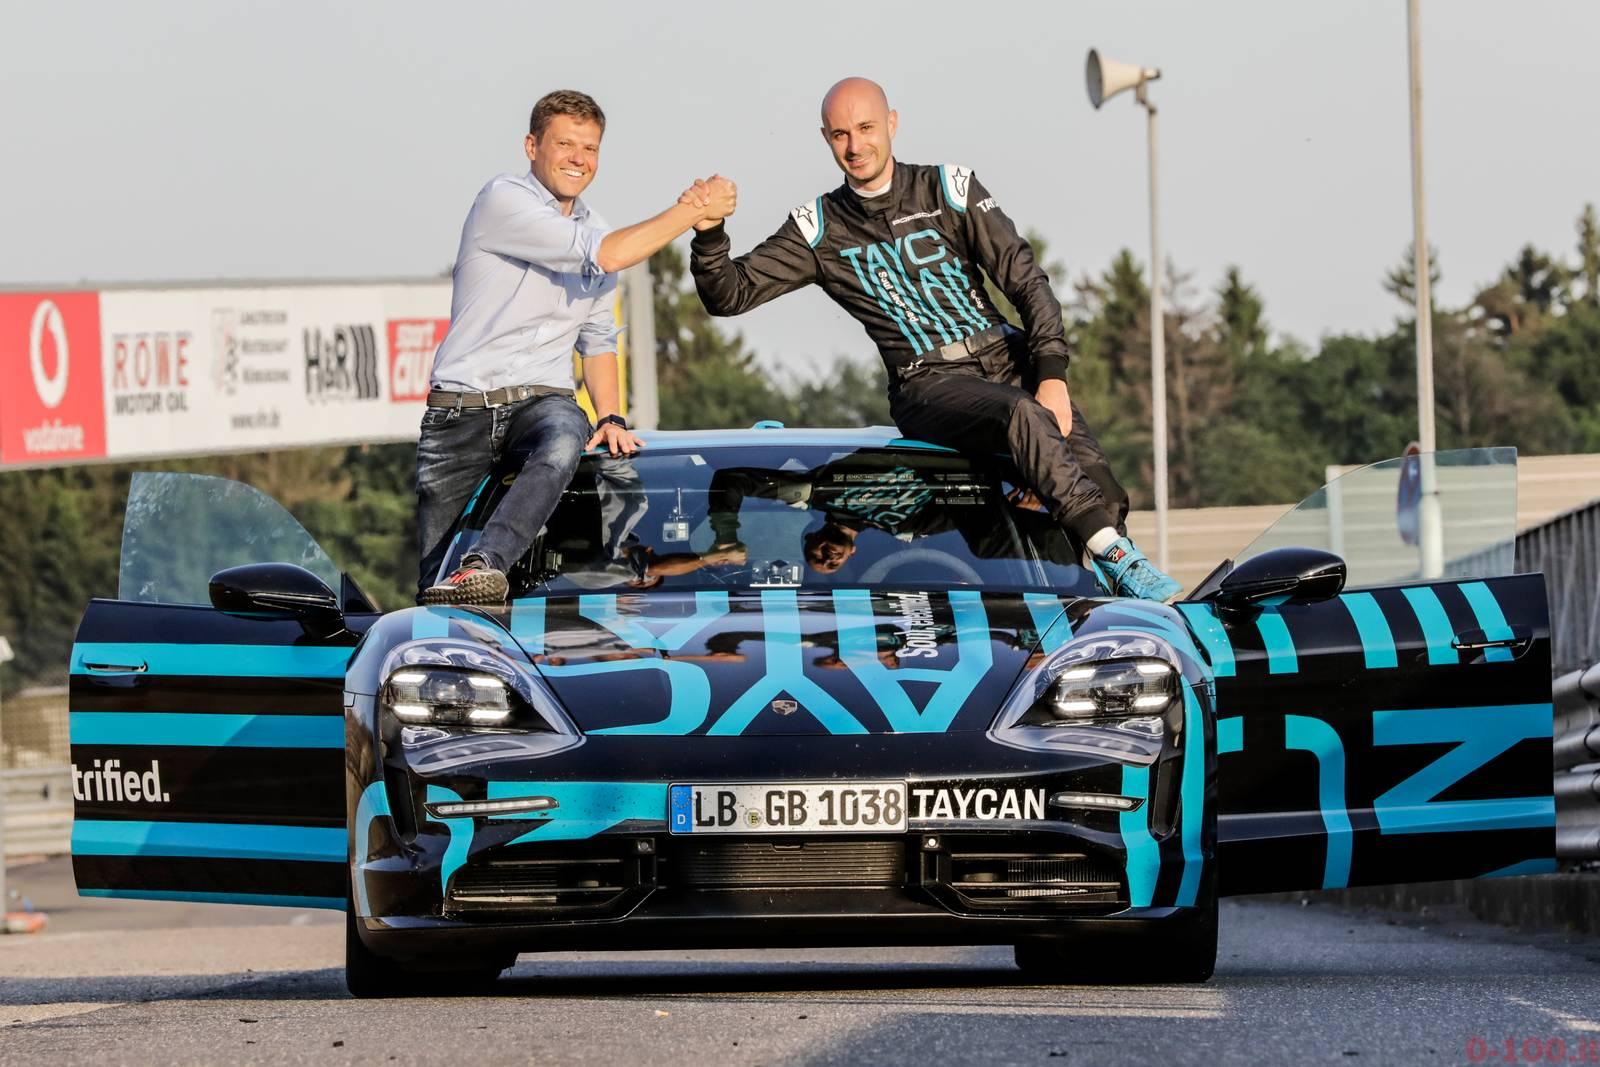 porsche_taycan_record_nurburgring_0-100_4